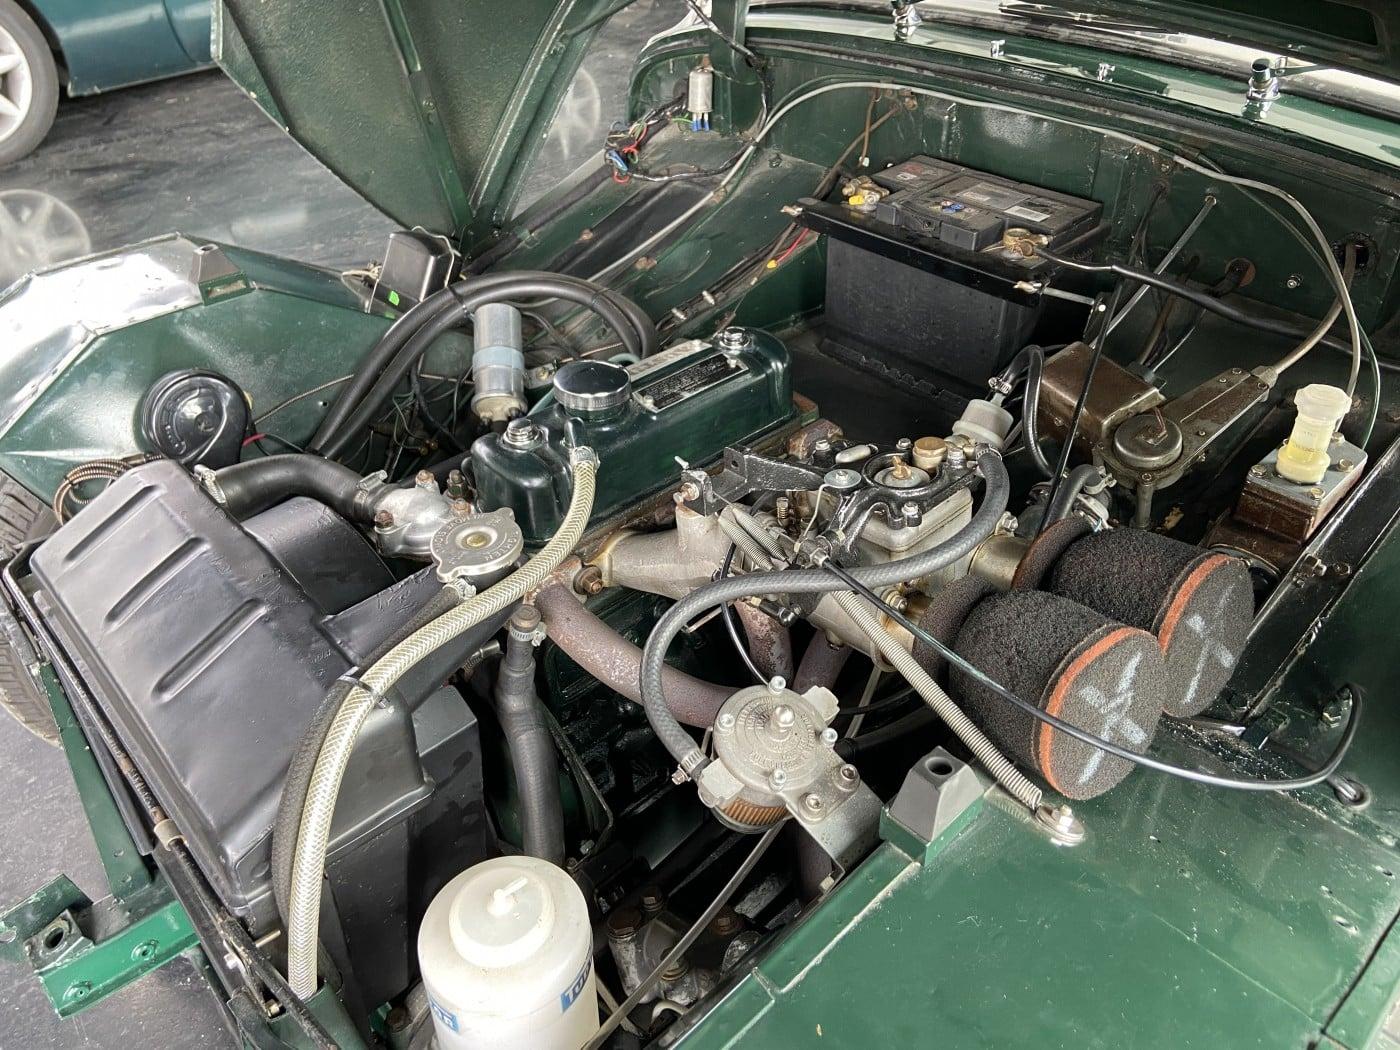 voiture-ancienne-cforcar-austin-frogeye-vhc-19